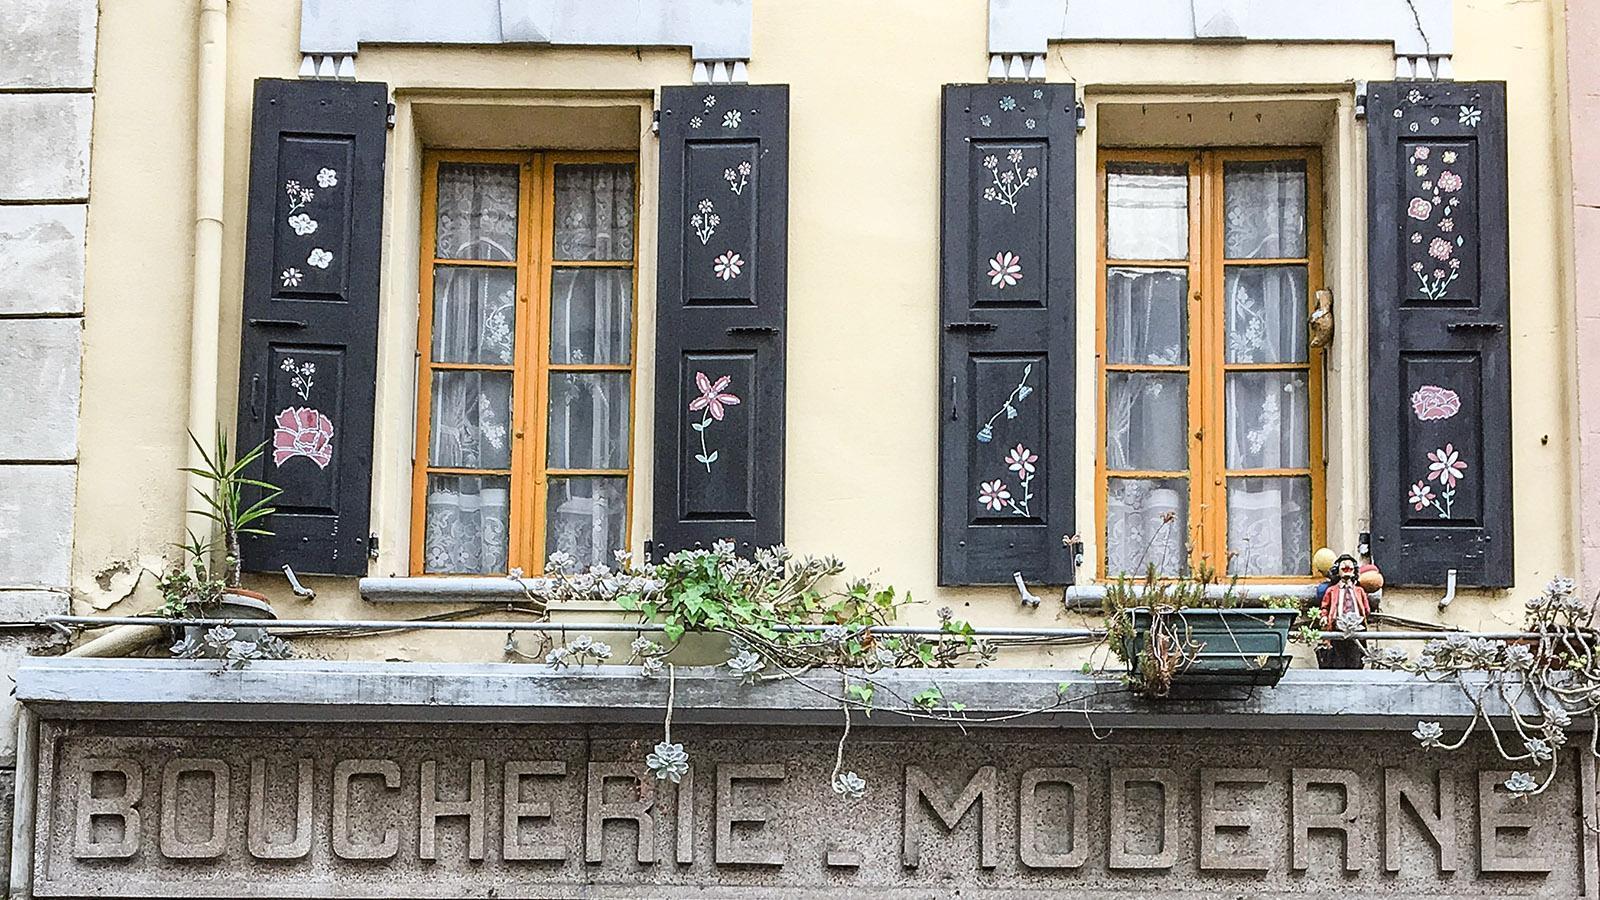 Arles-sur-Tech: Fensterschmuck oberhalb der Boucherie Mordene. Foto: Hilke Maunder